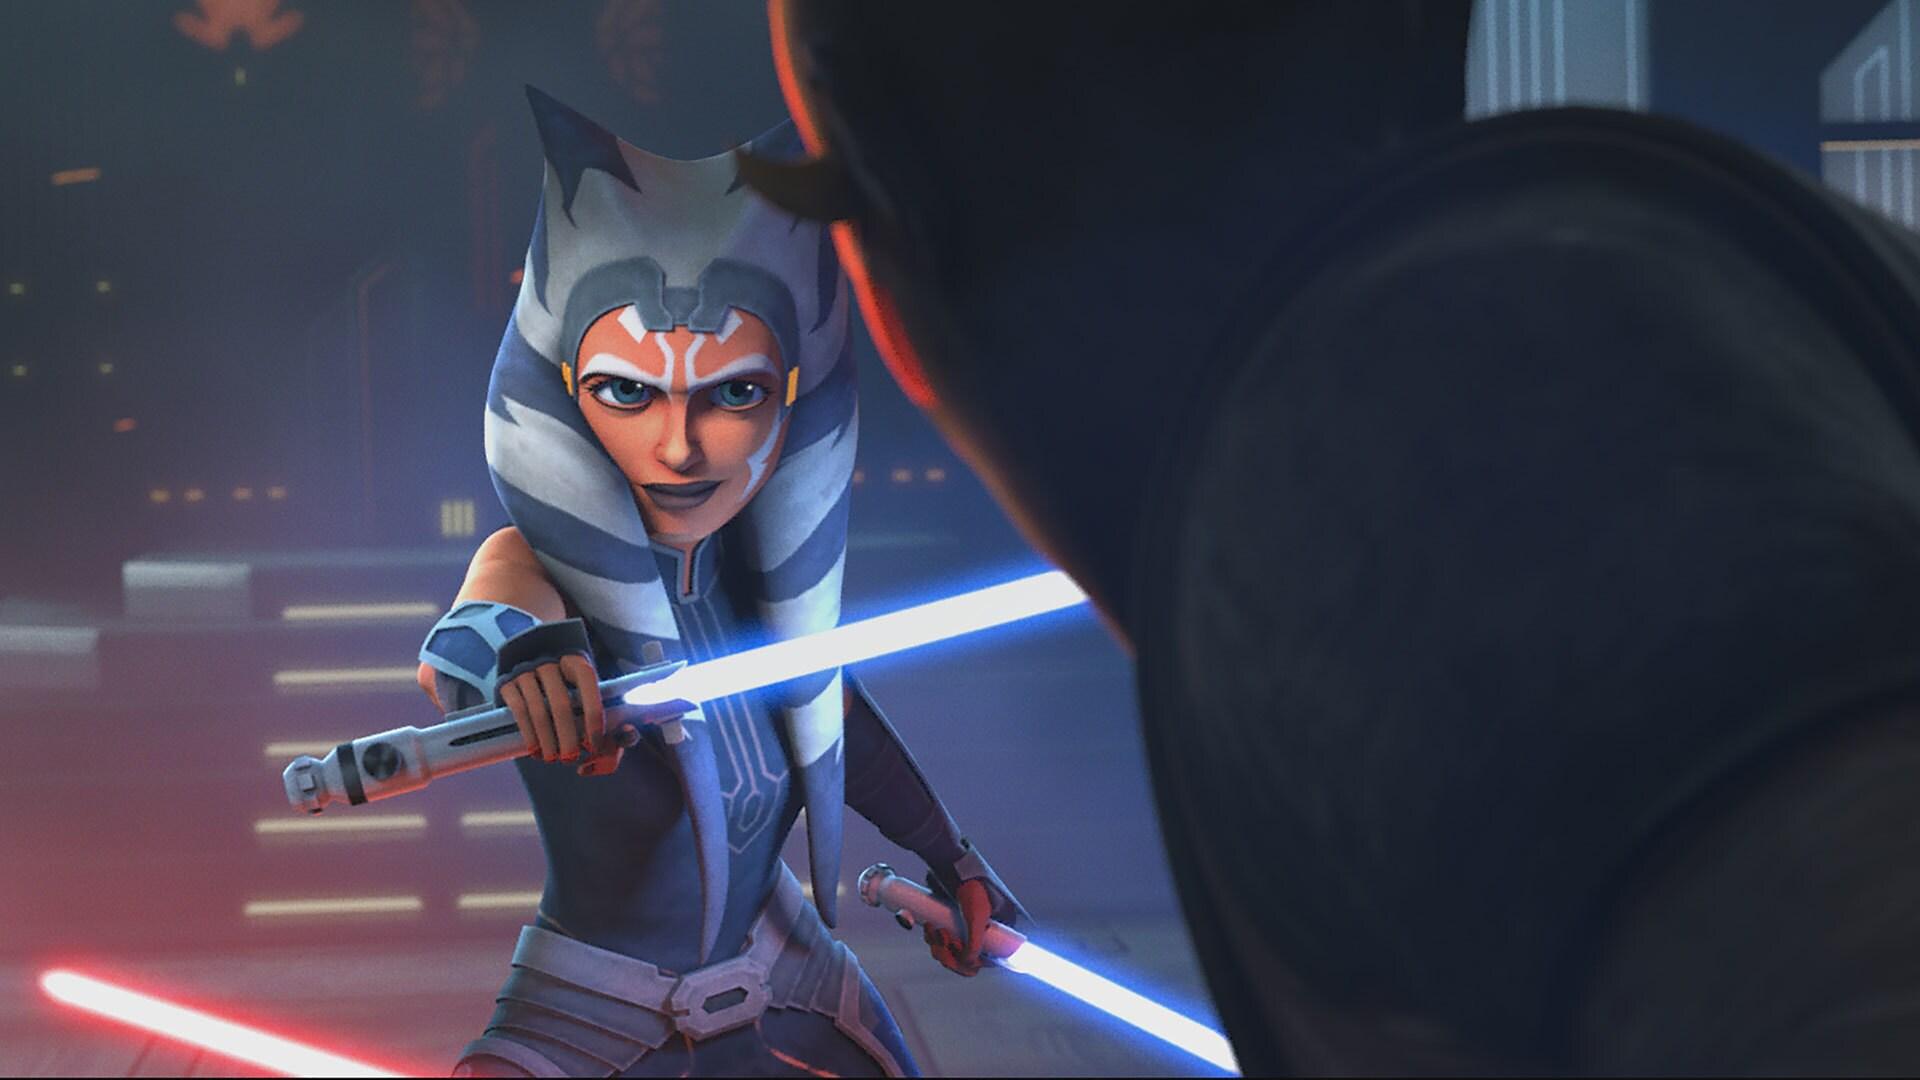 Inside the Final Duel: Maul Vs. Ahsoka - Star Wars: The Clone Wars